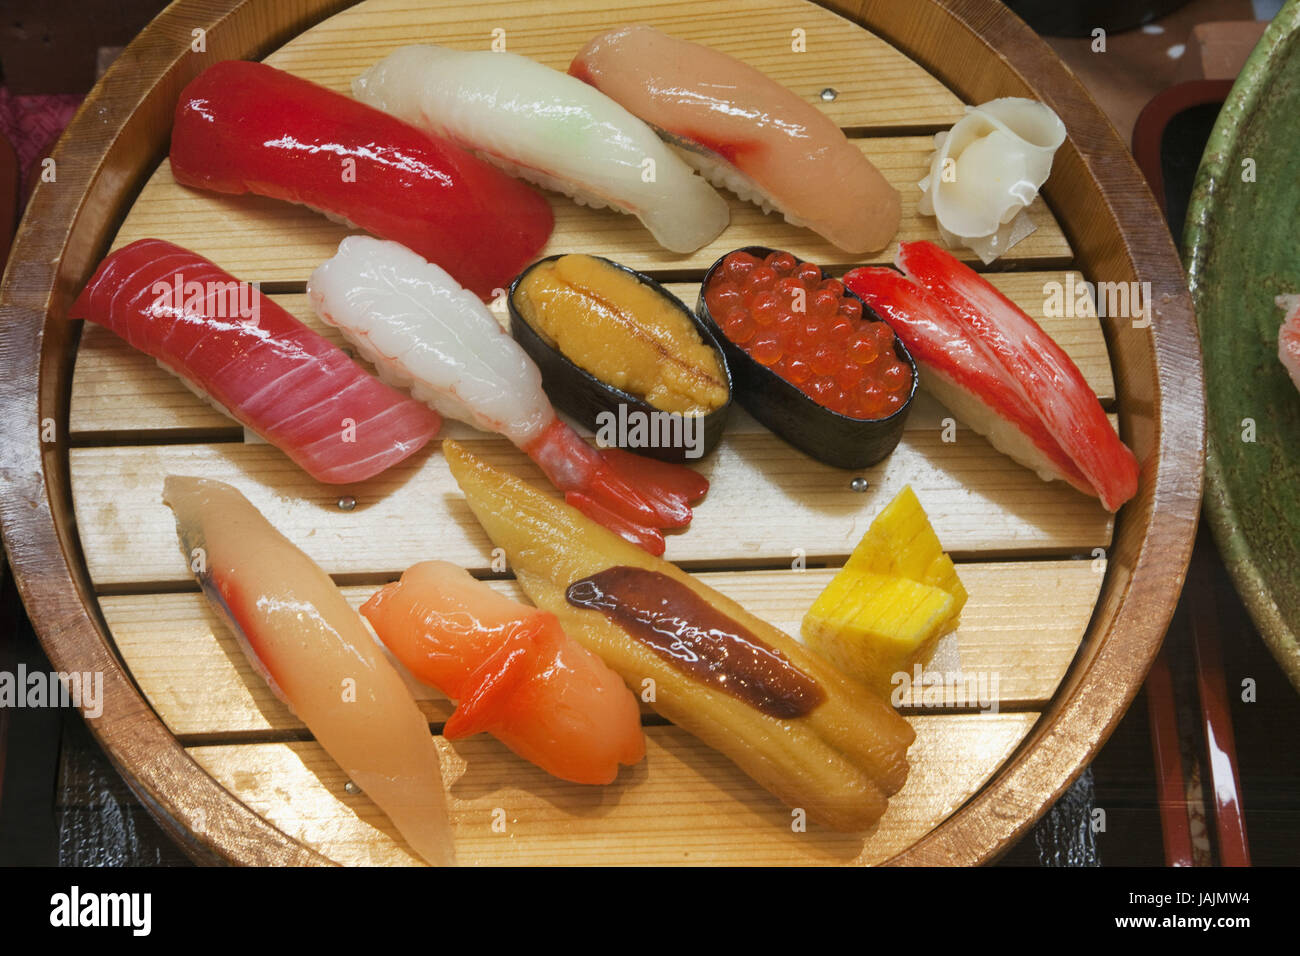 Japan,Tokyo,restaurant,food,sushi,simulation, - Stock Image